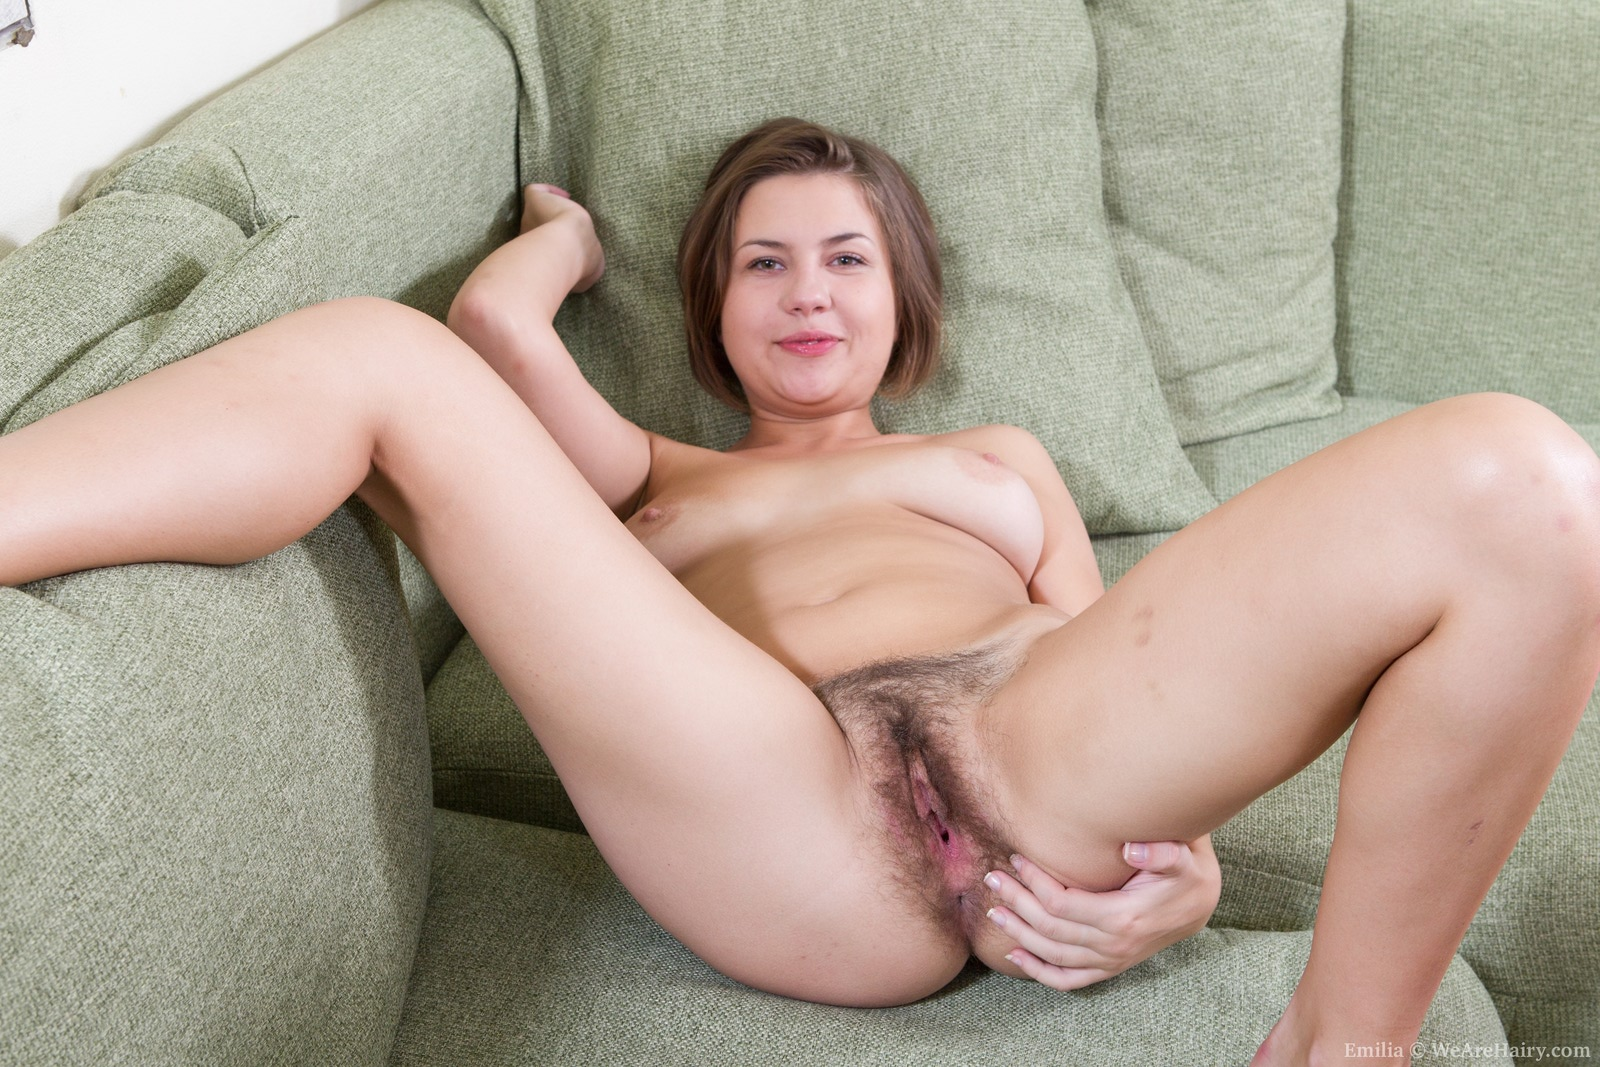 Между ног женщину